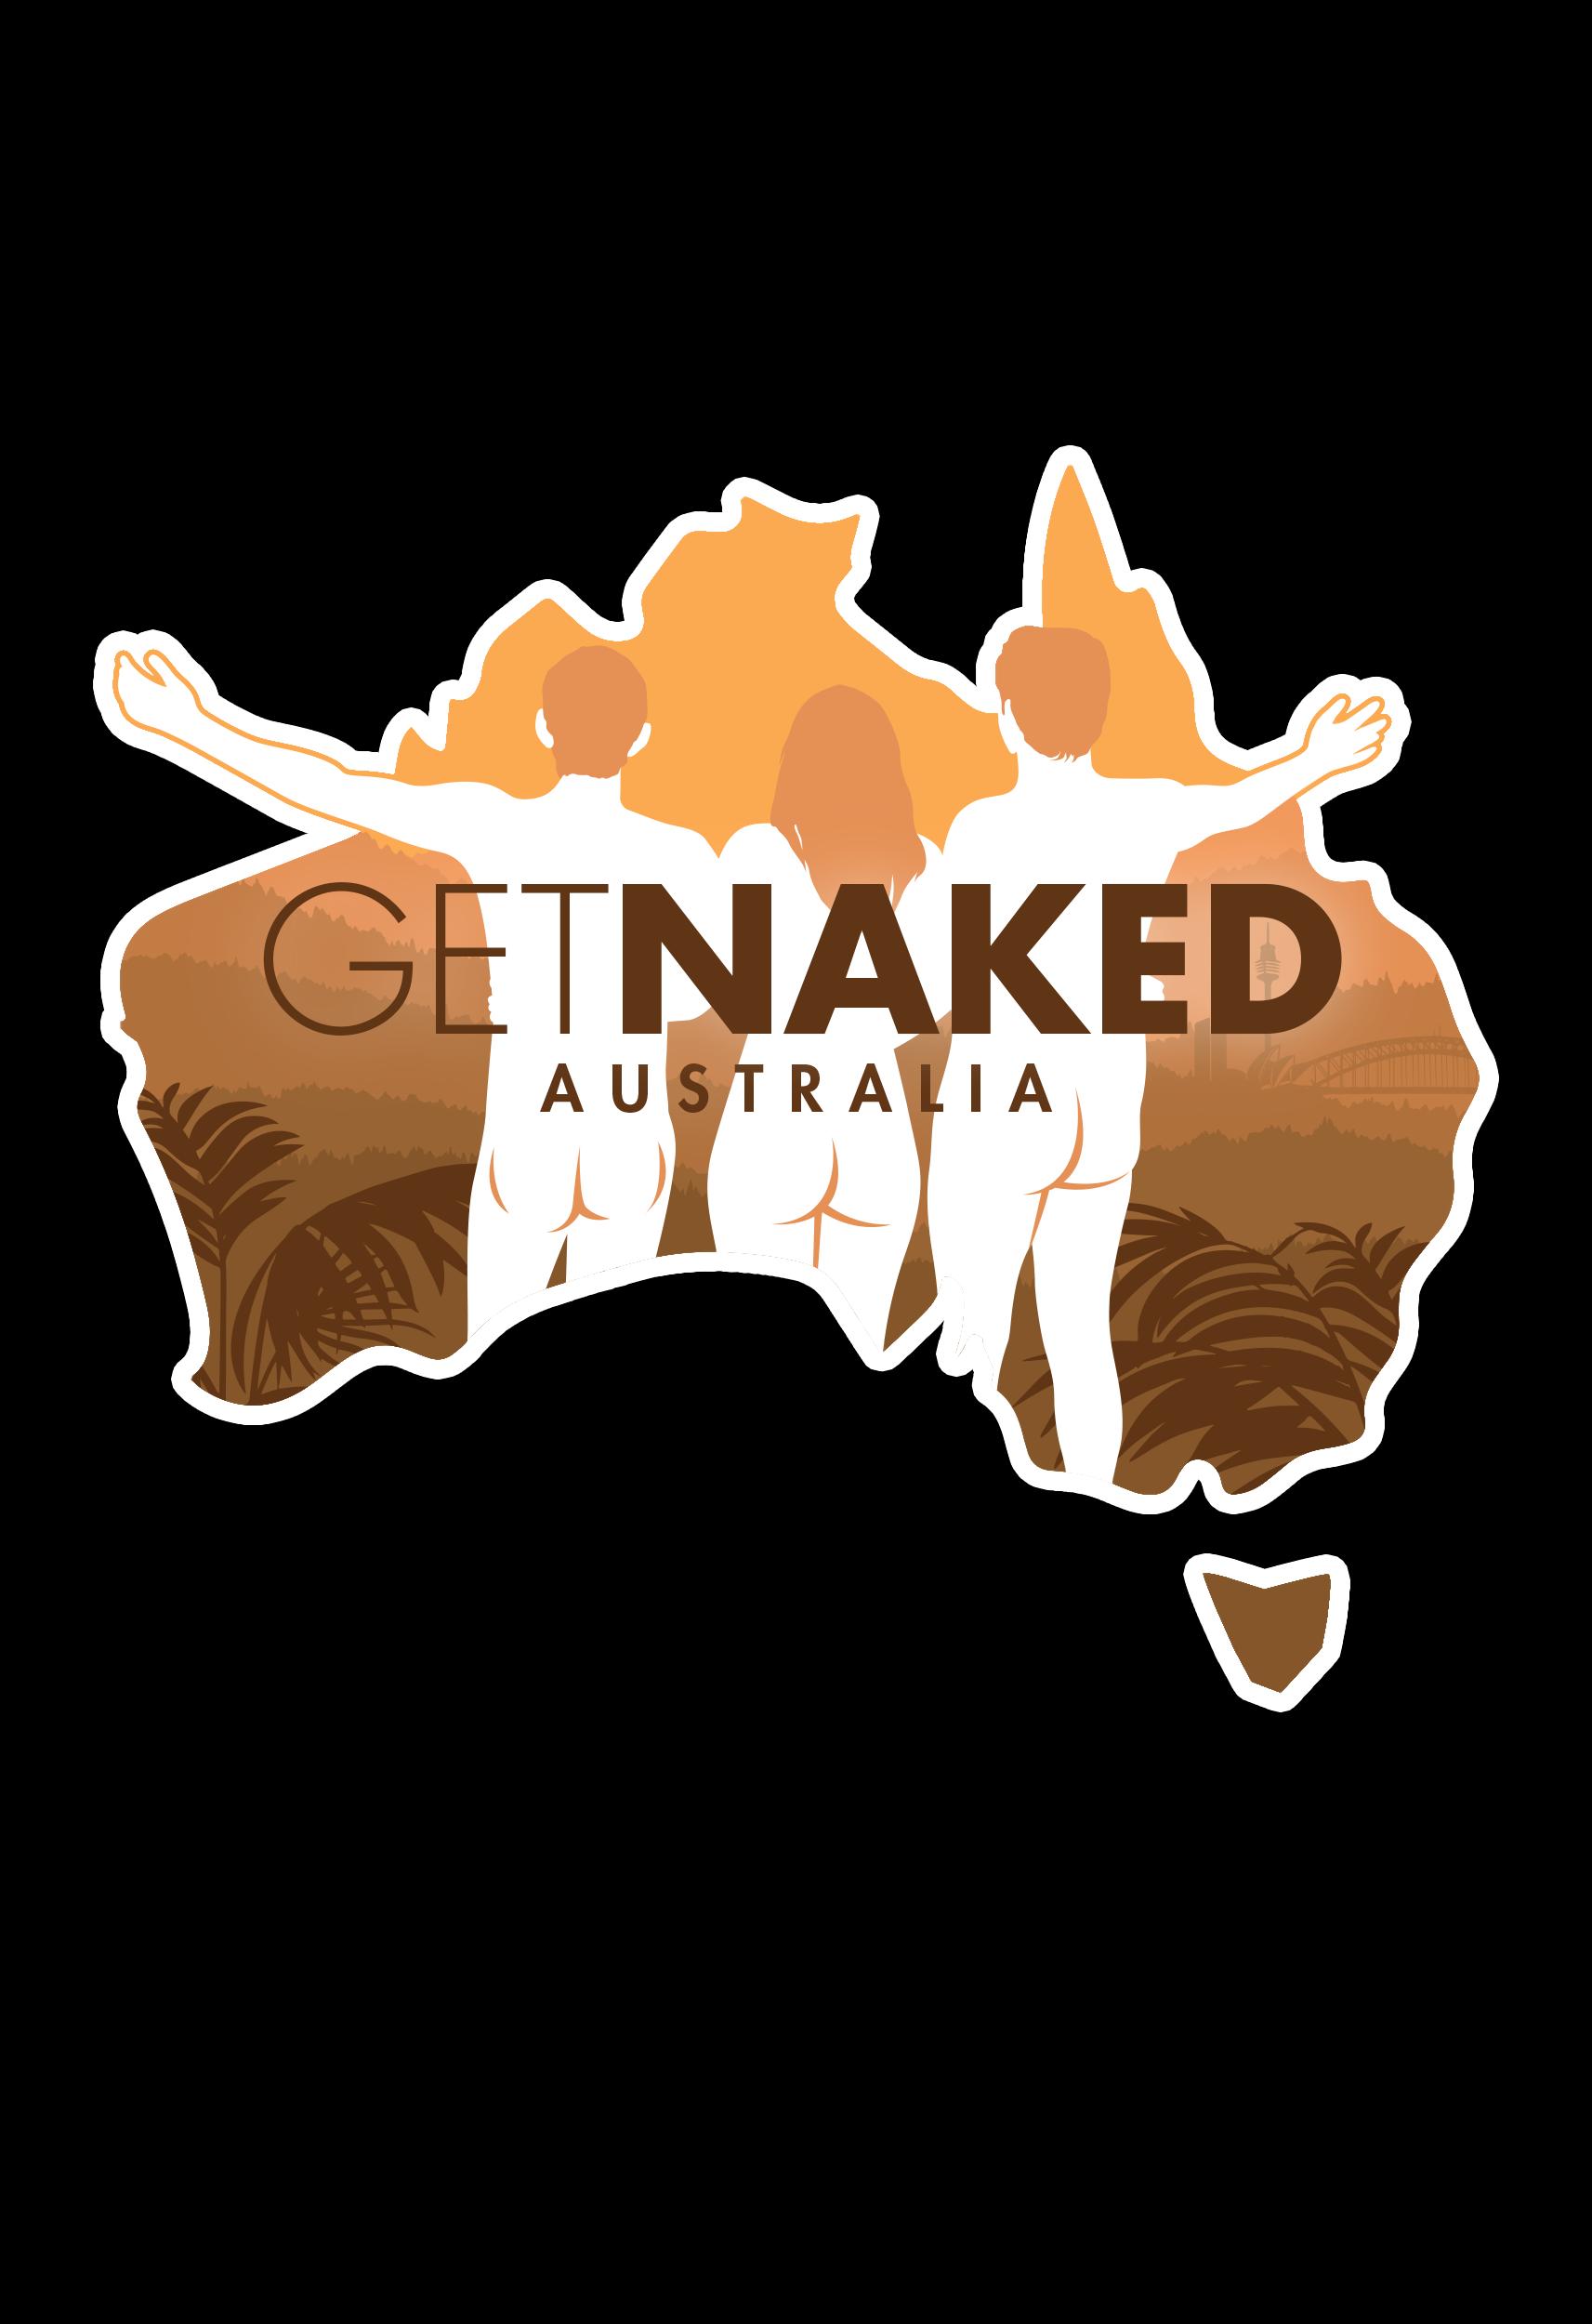 GNA Shirt (Unisex) - Get Naked Australia